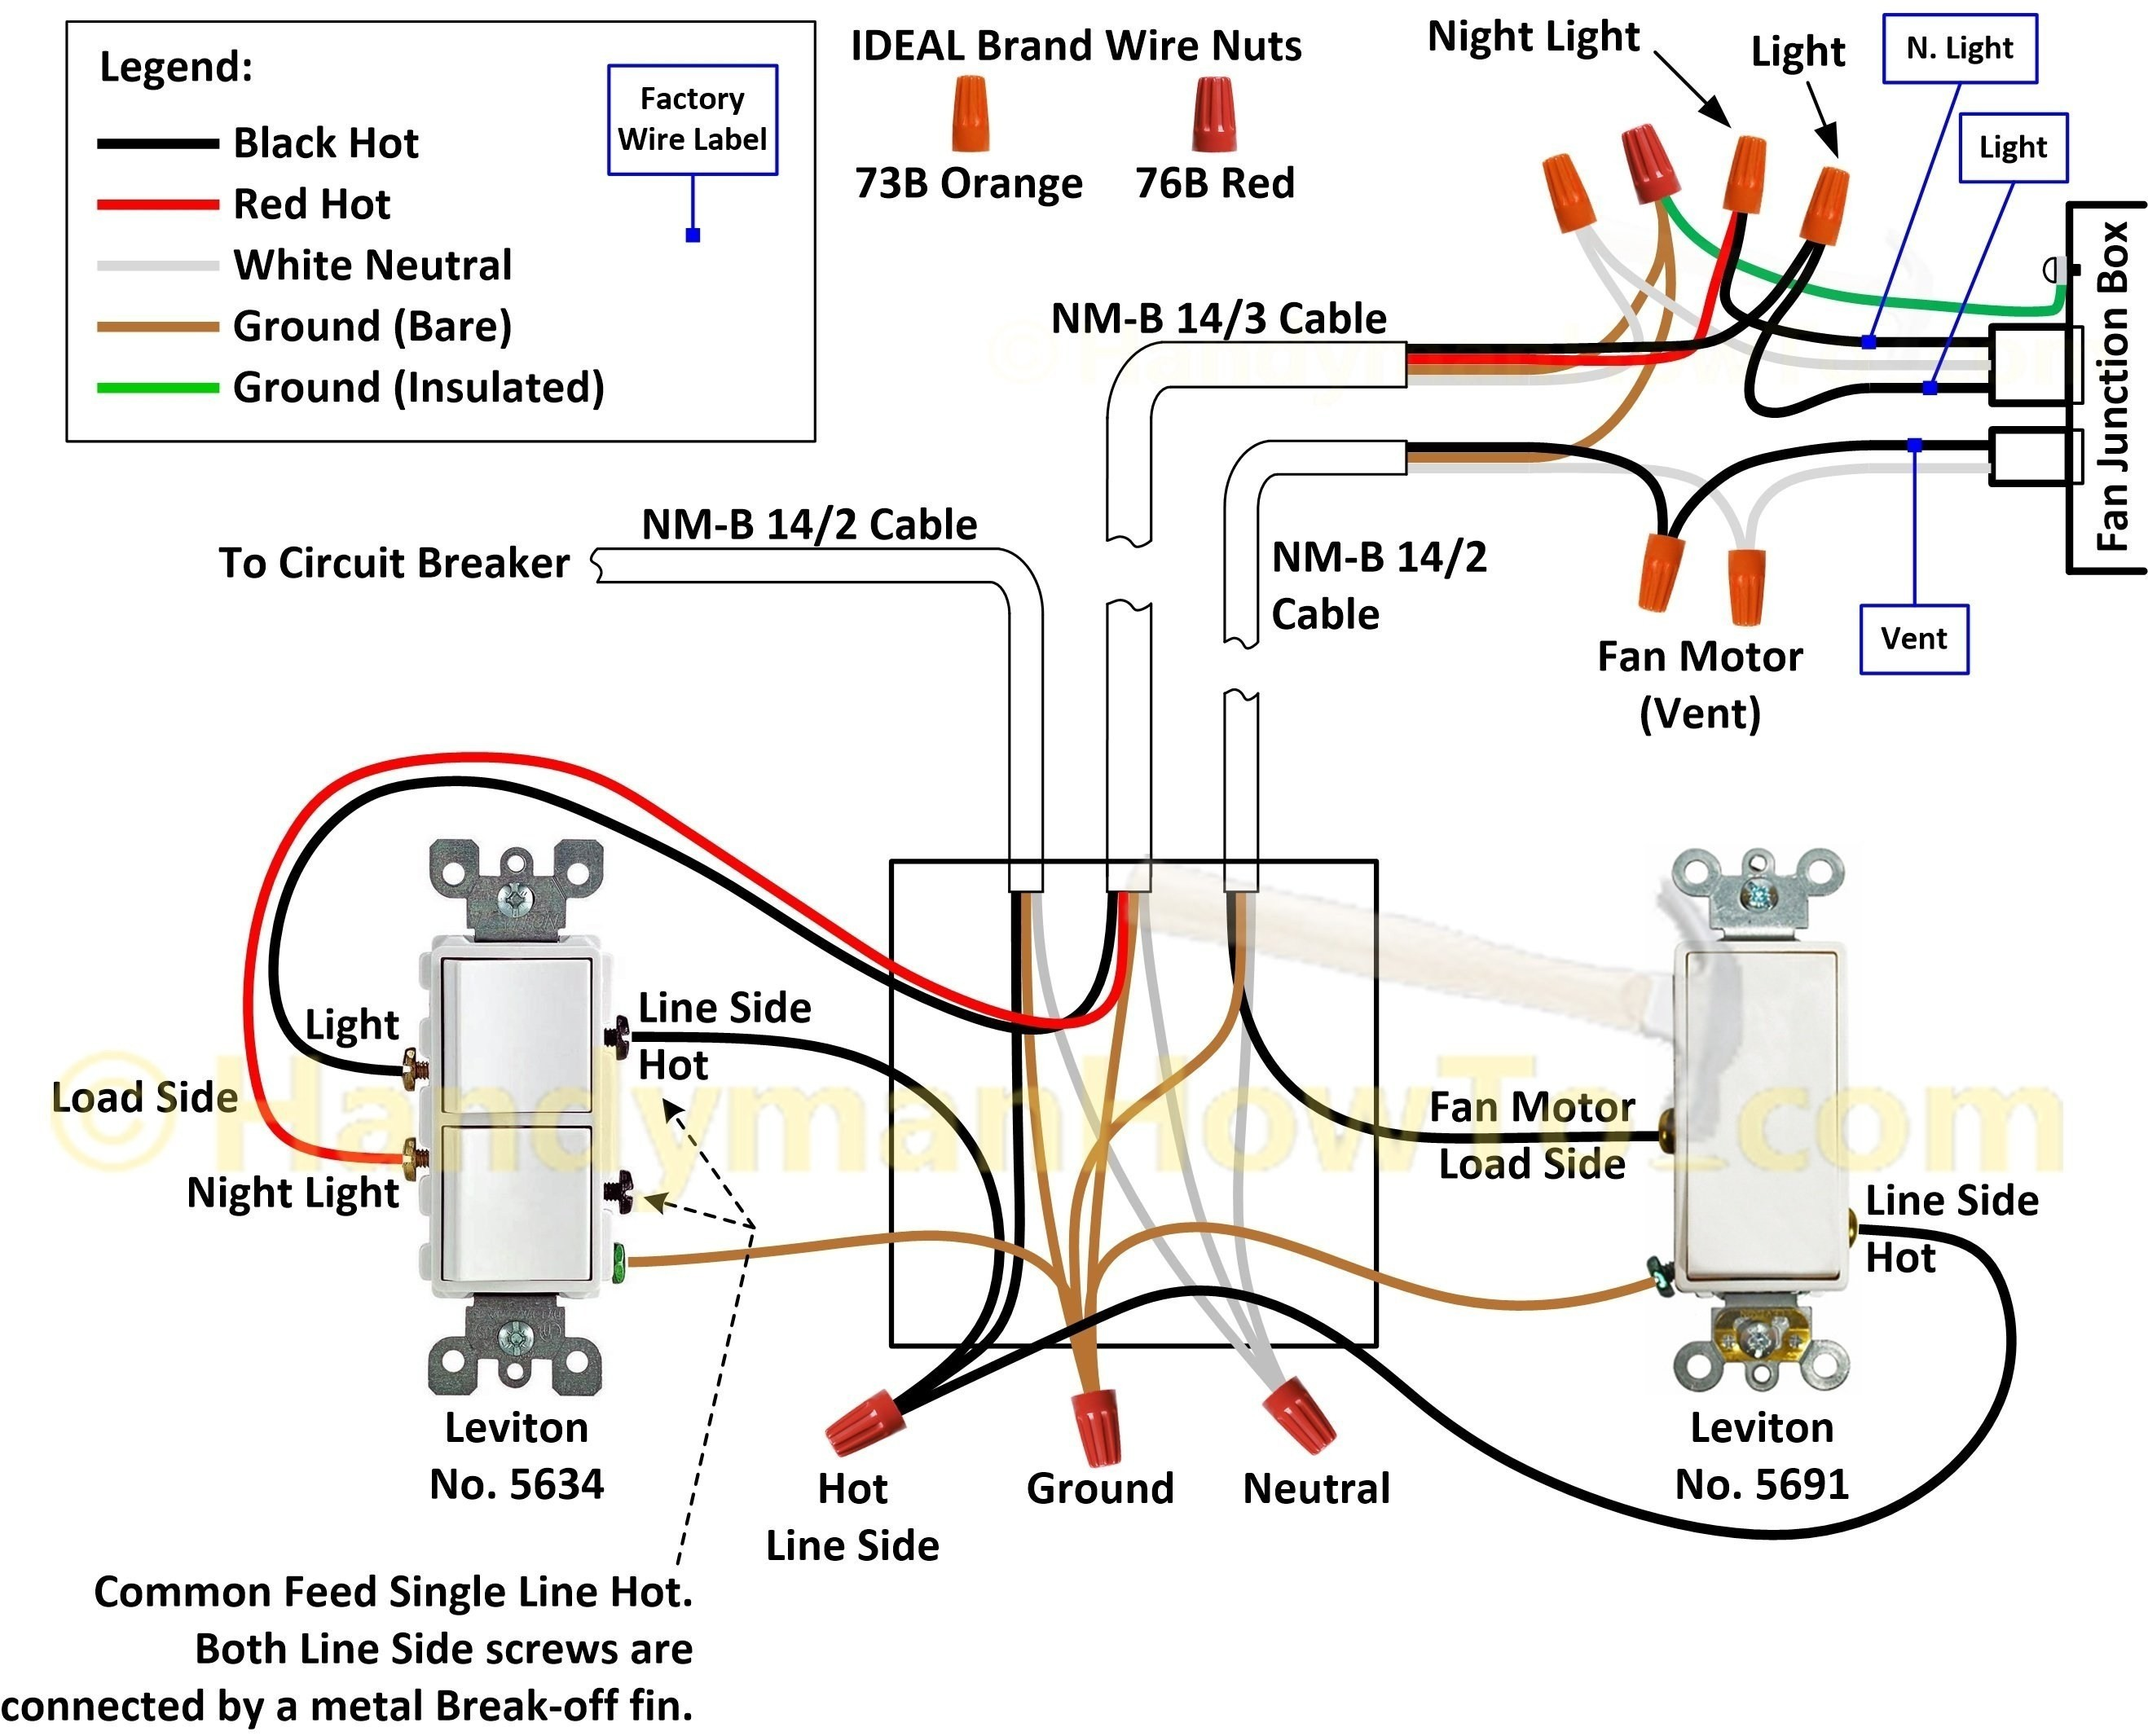 Electrical Wiring Diagrams Example Wiring Diagram Lighting Circuit Valid Hardware Diagram 0d